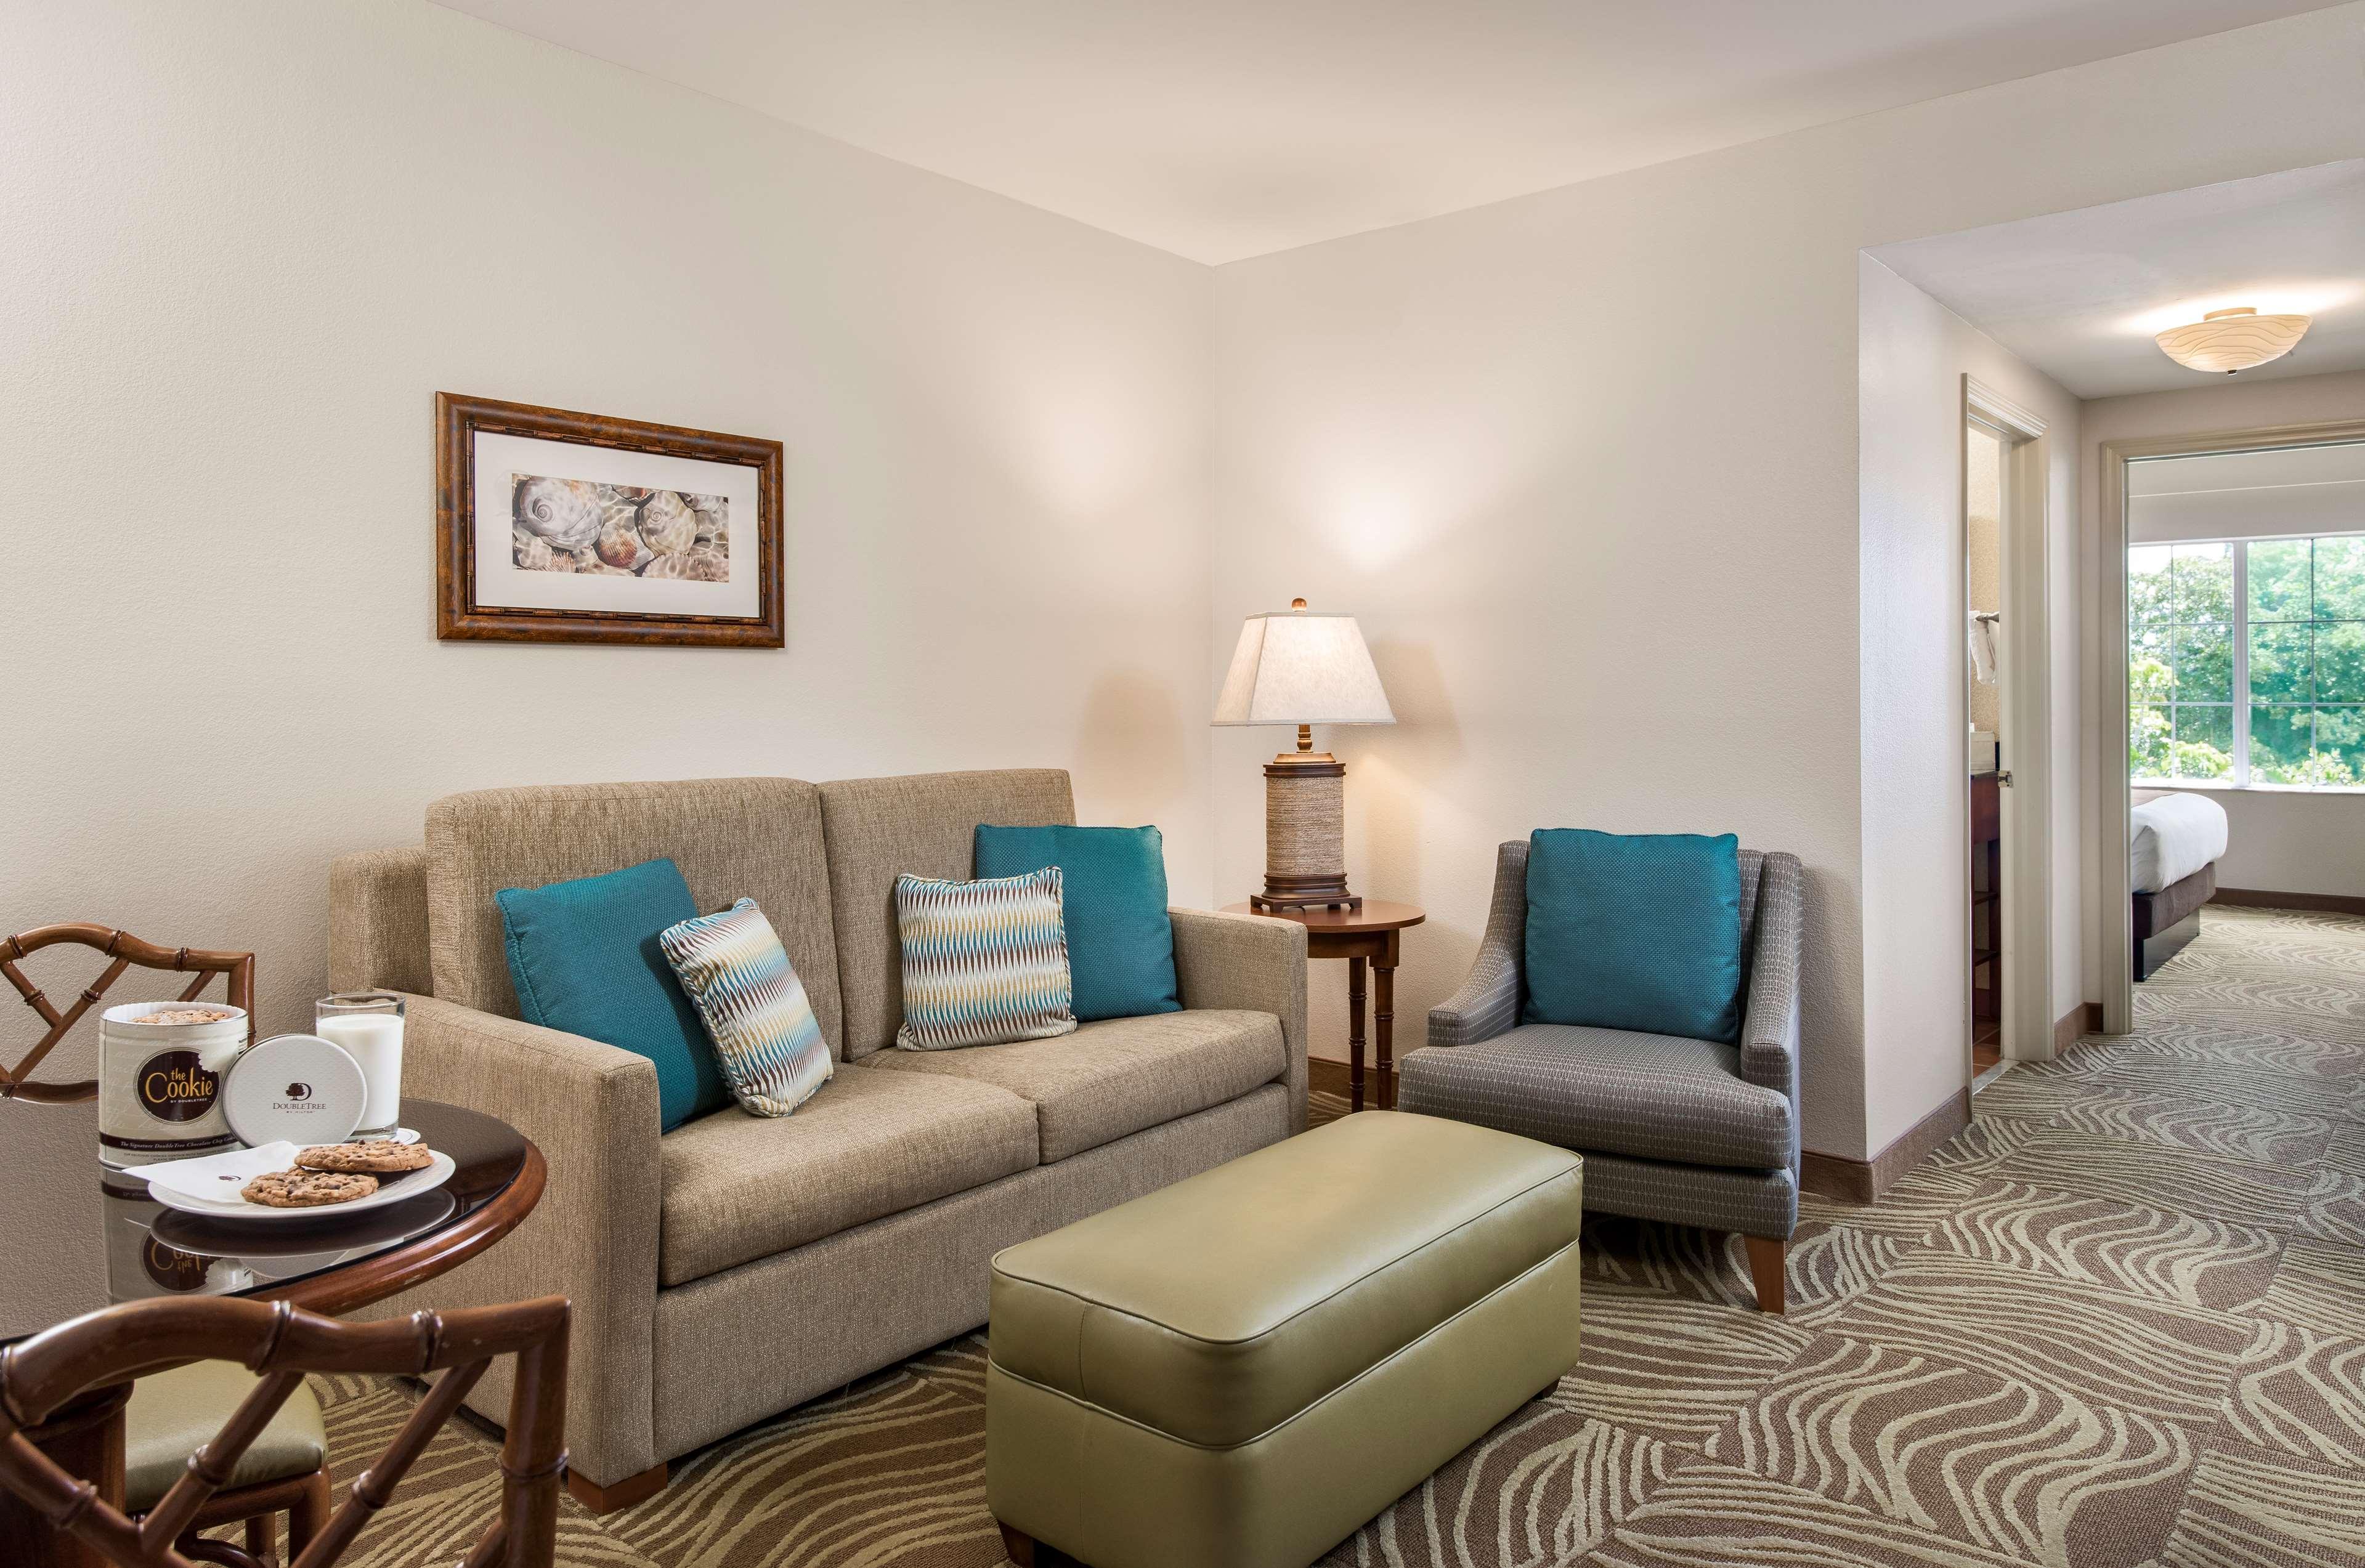 DoubleTree Suites by Hilton Hotel Naples image 19